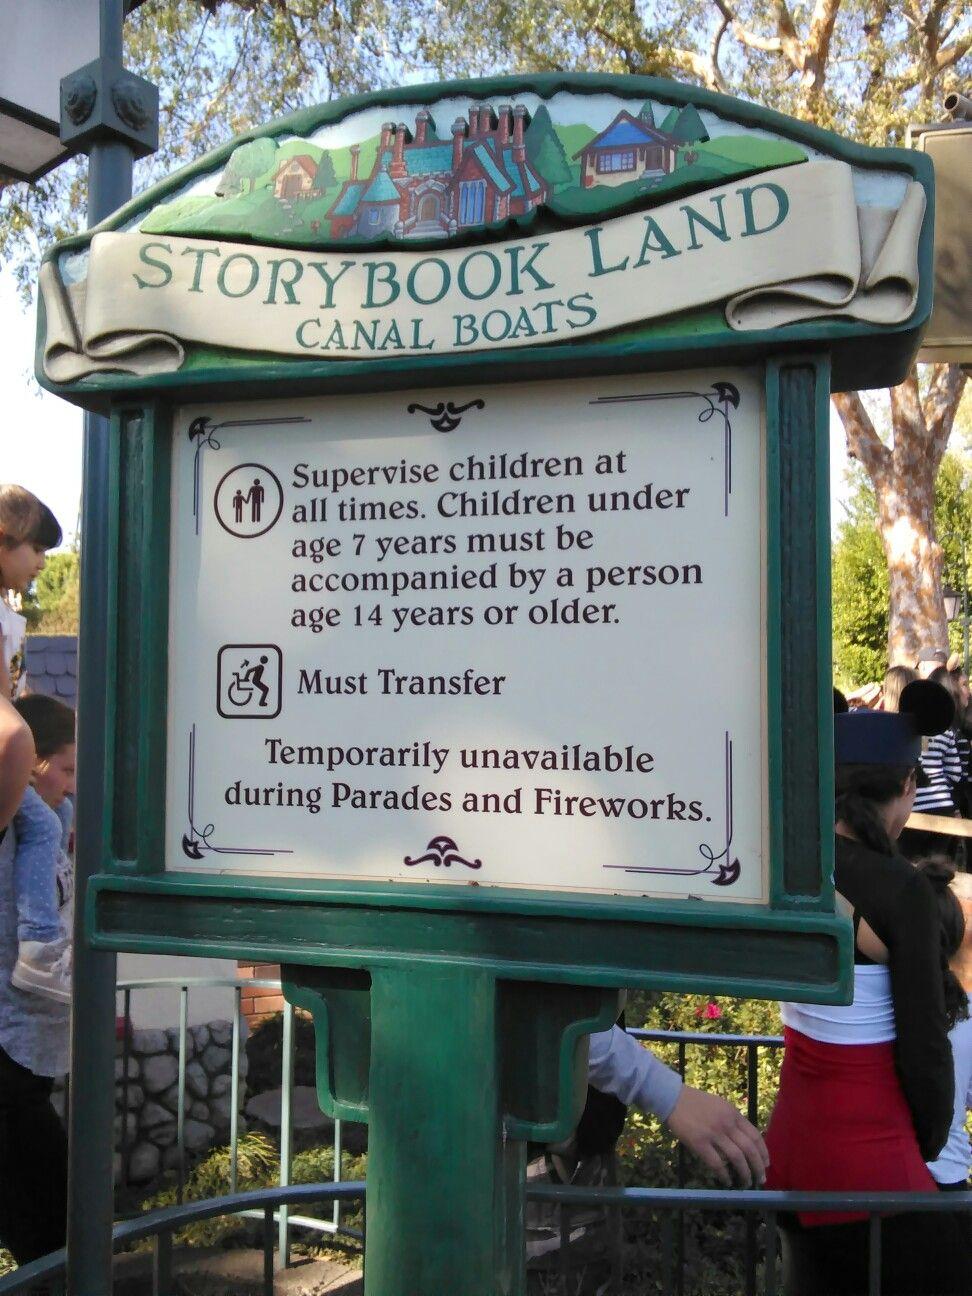 I love story book land